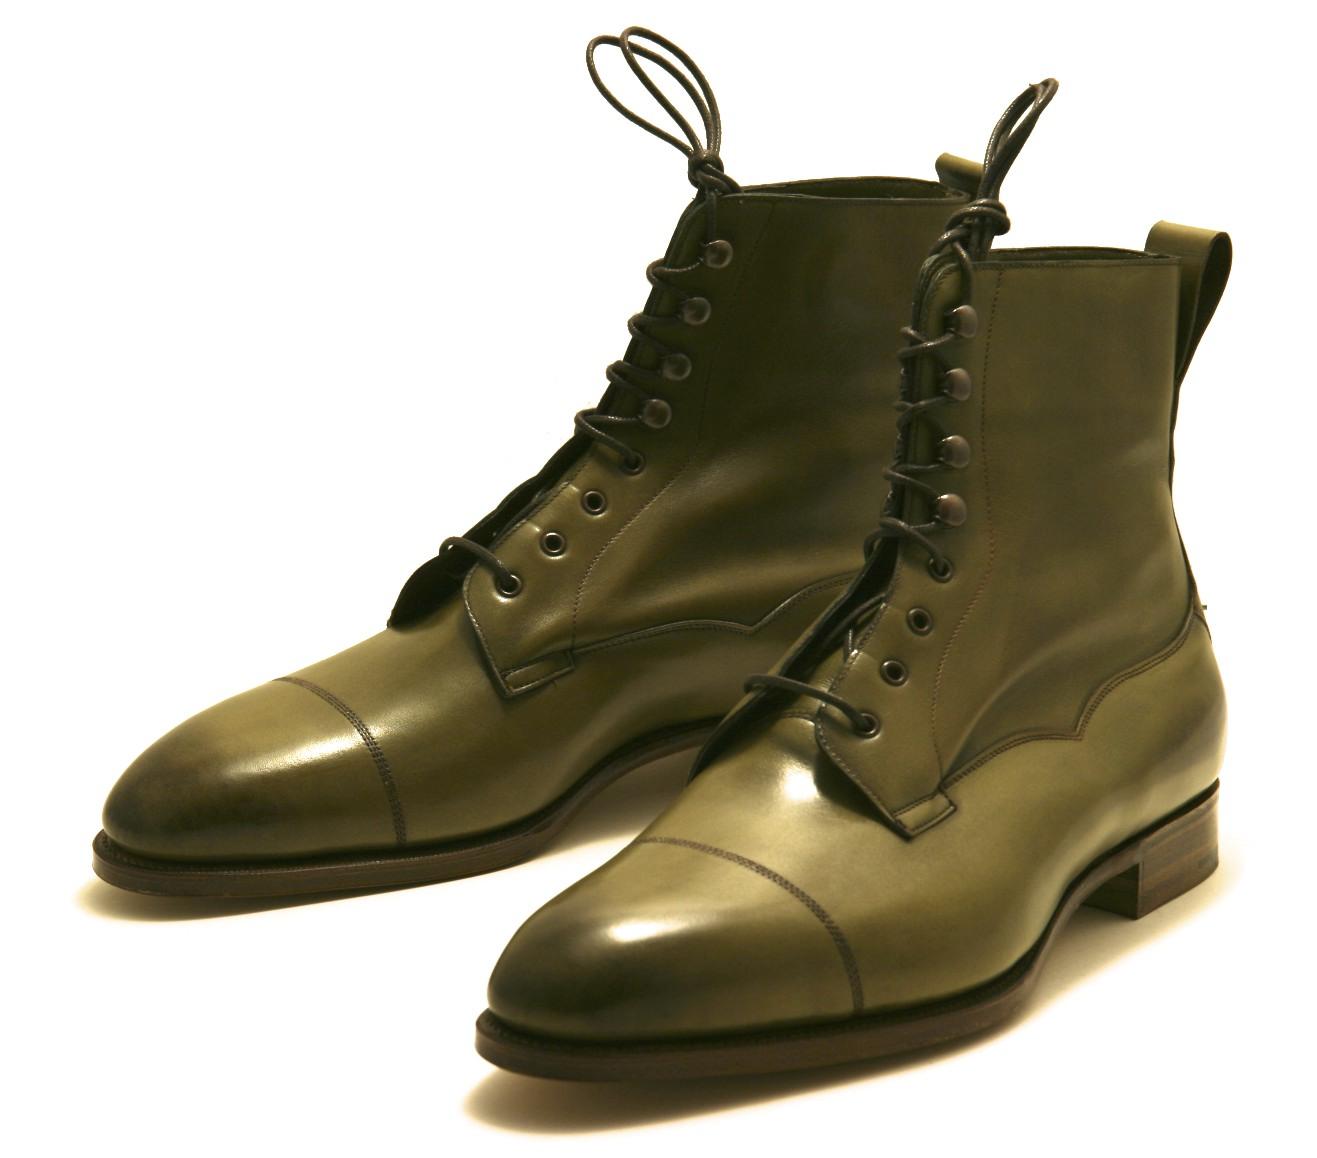 Edward Green Shoes New York